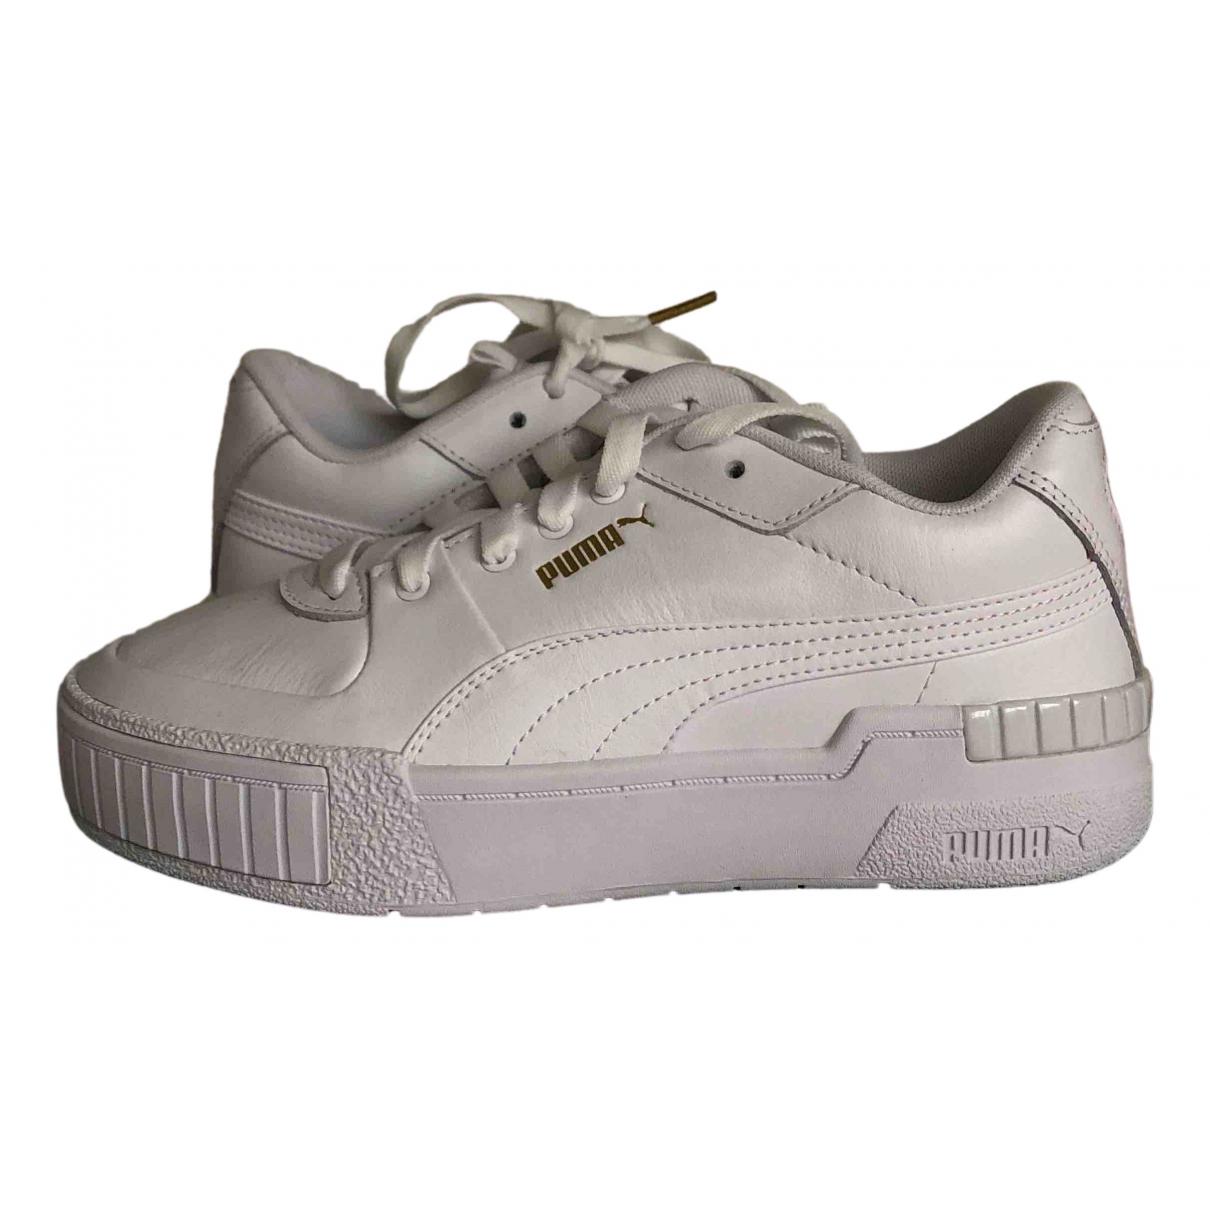 Puma \N White Leather Trainers for Women 37 EU